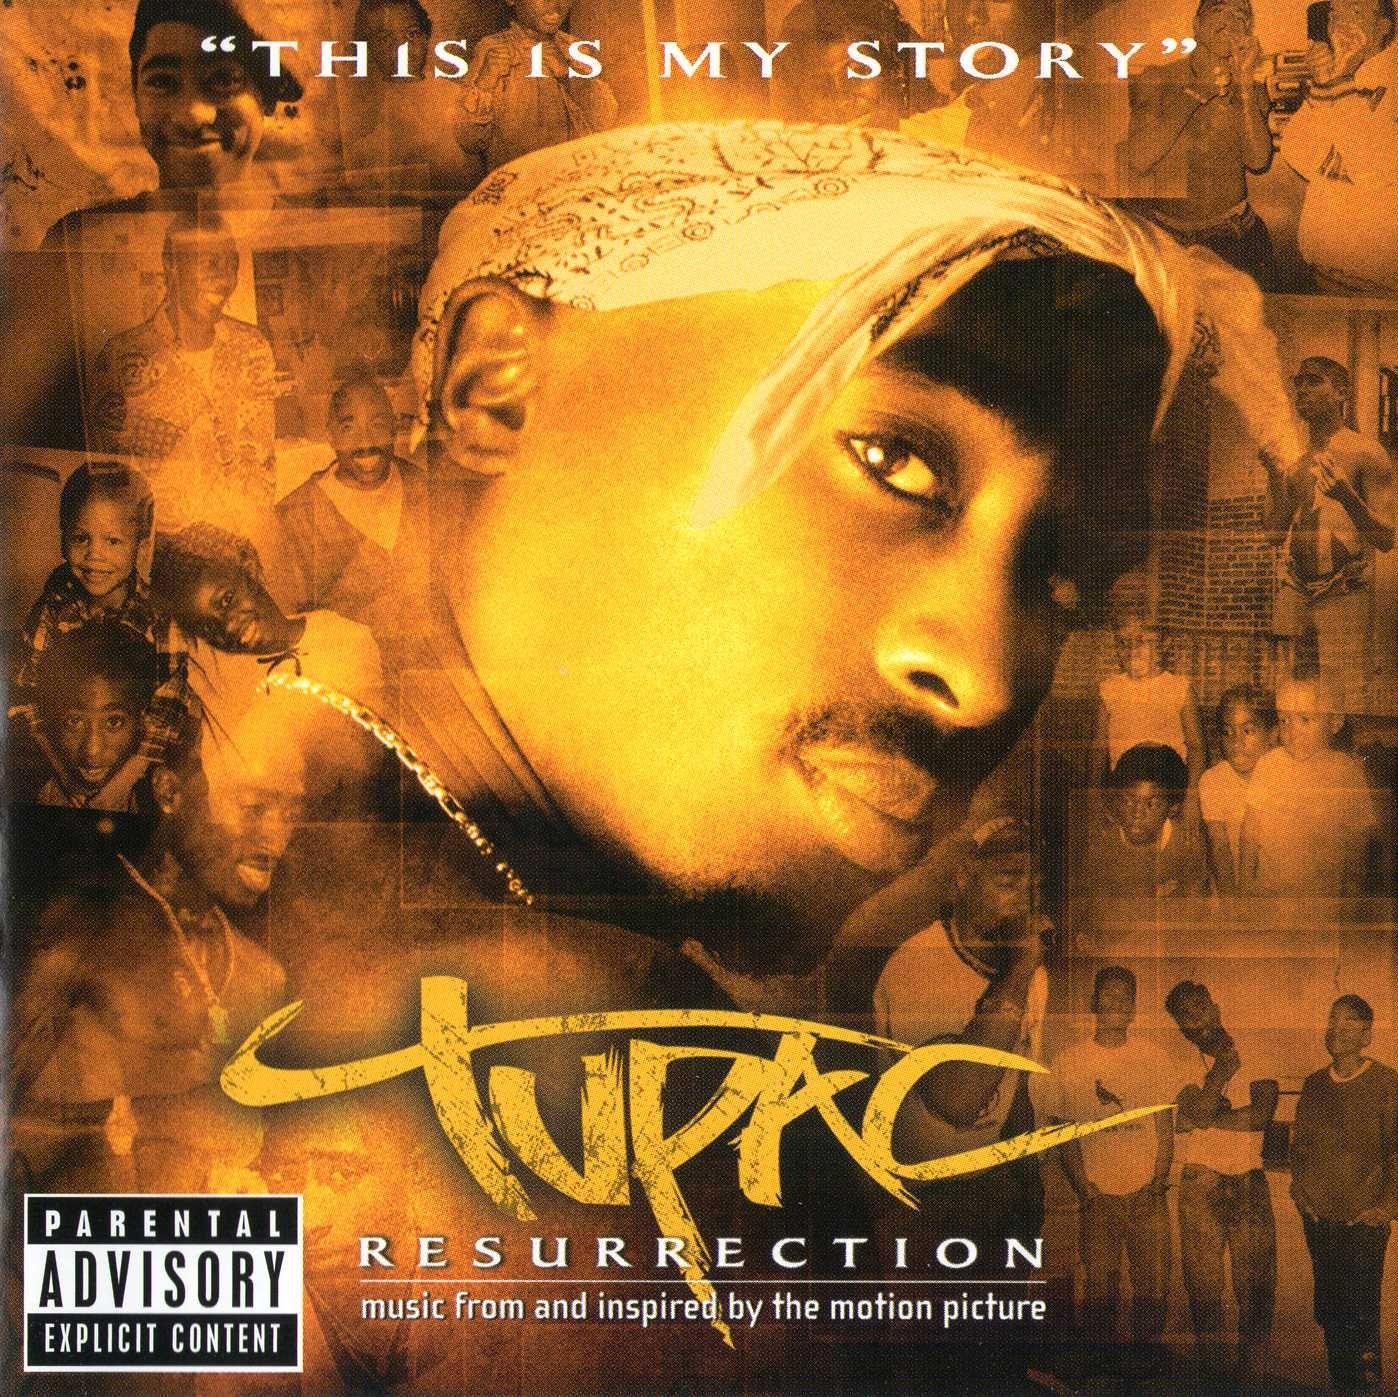 2pac - Resurrection album cover